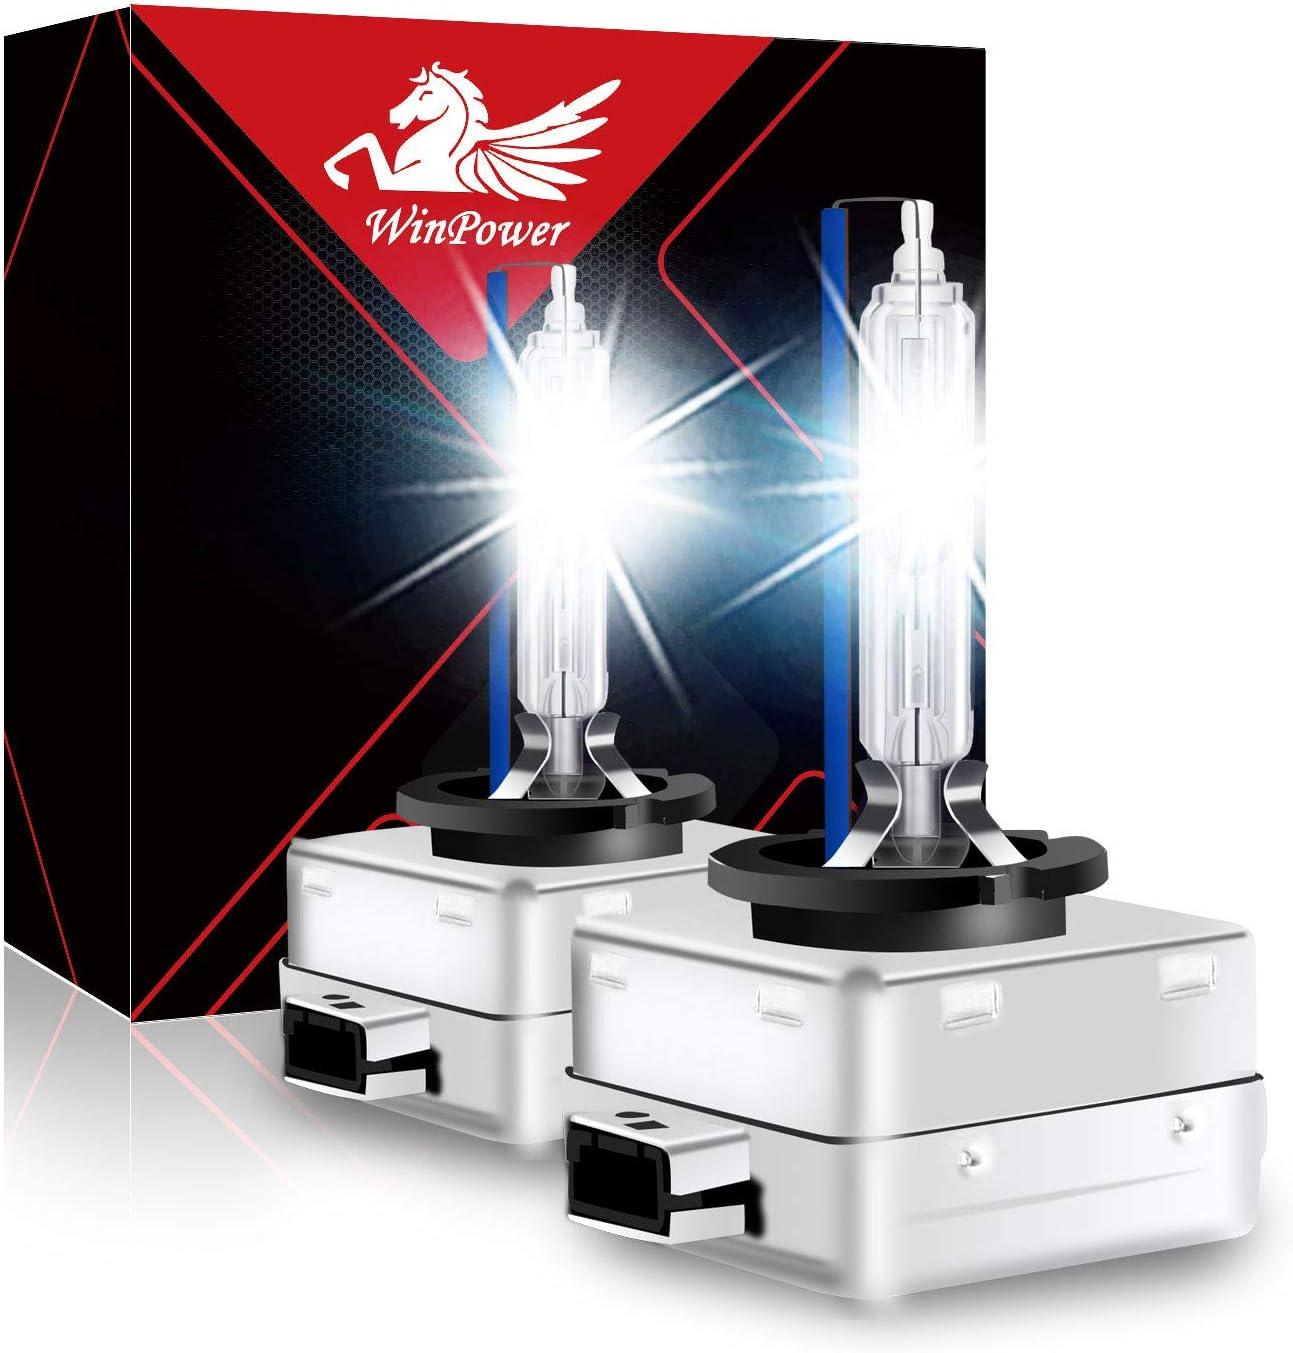 WinPower D1S 35W Bulbo del faro de xenón Lampara de descarga Reemplazar kit para bombillas HID de coche 8000K Blanco frio (2 Lamparas)